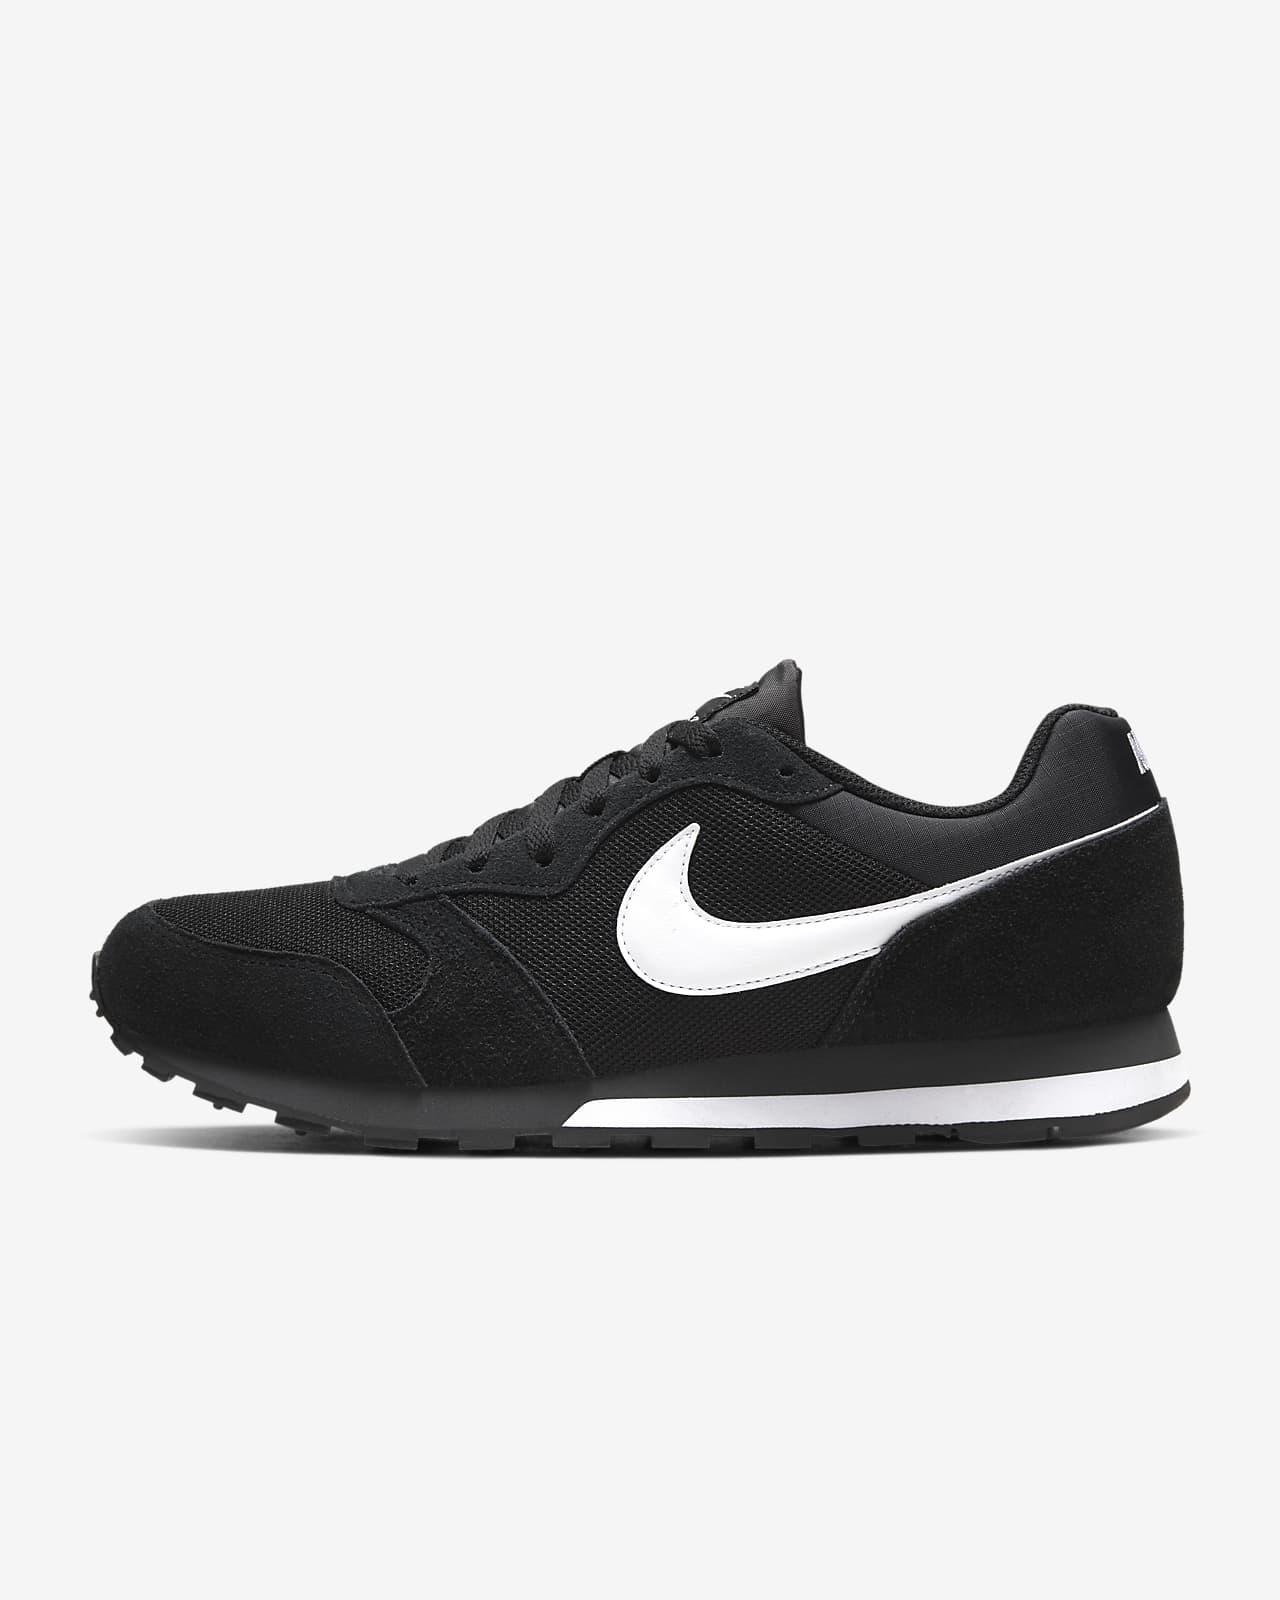 مدرب الوحل فتيل Nike Md Runner 2 Heren Sneakers Dsvdedommel Com